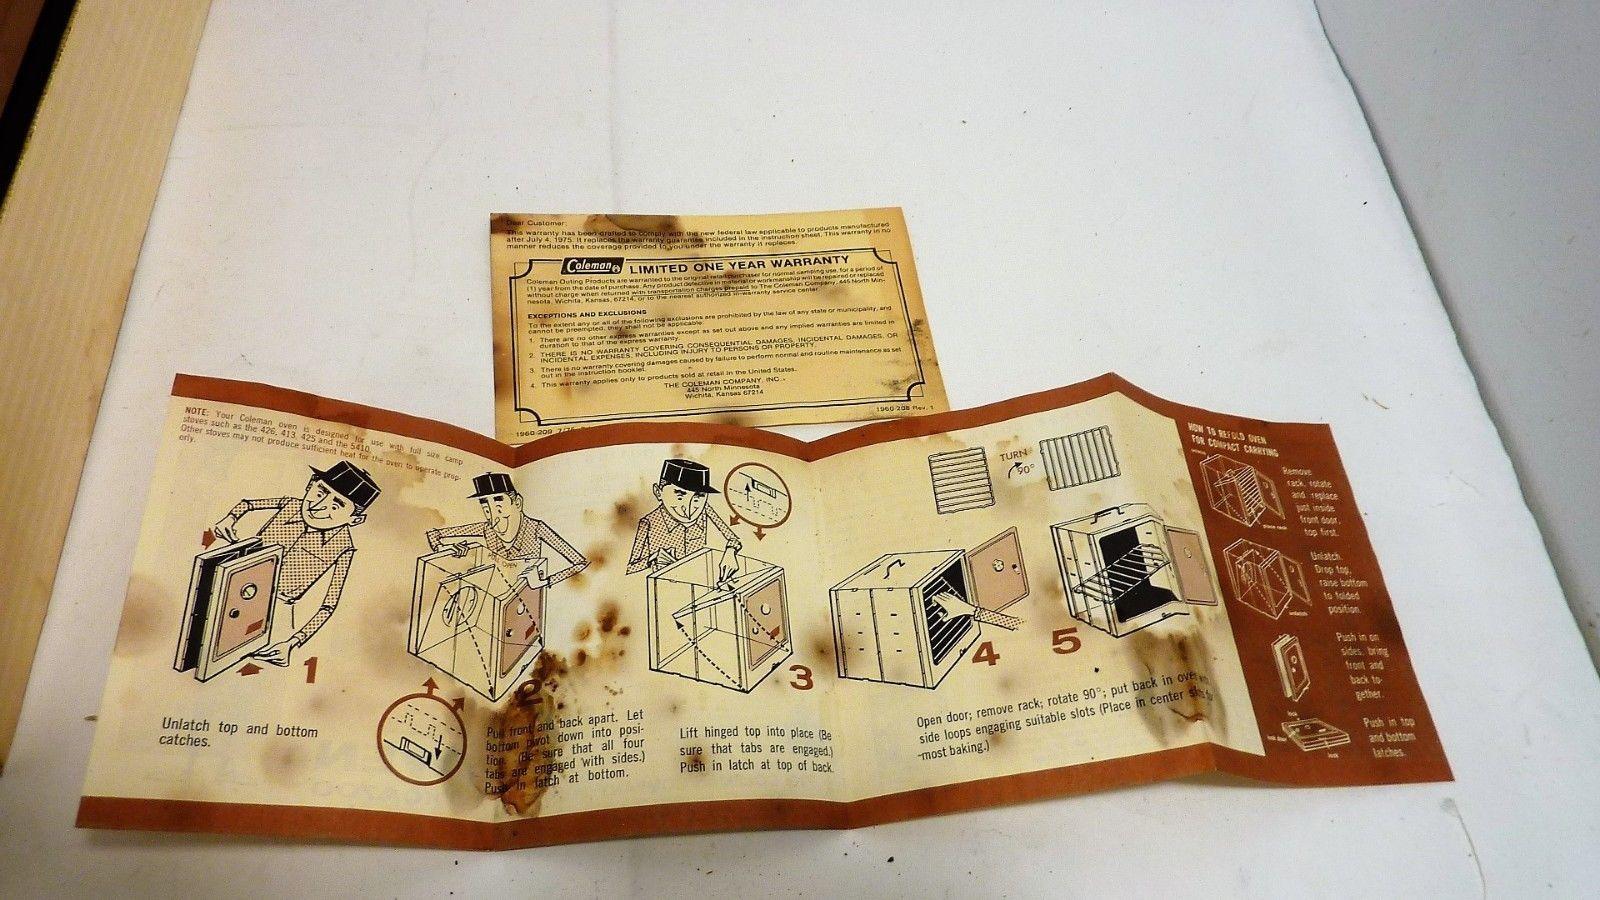 Vintage Coleman Folding Camp Oven Original and 14 similar items